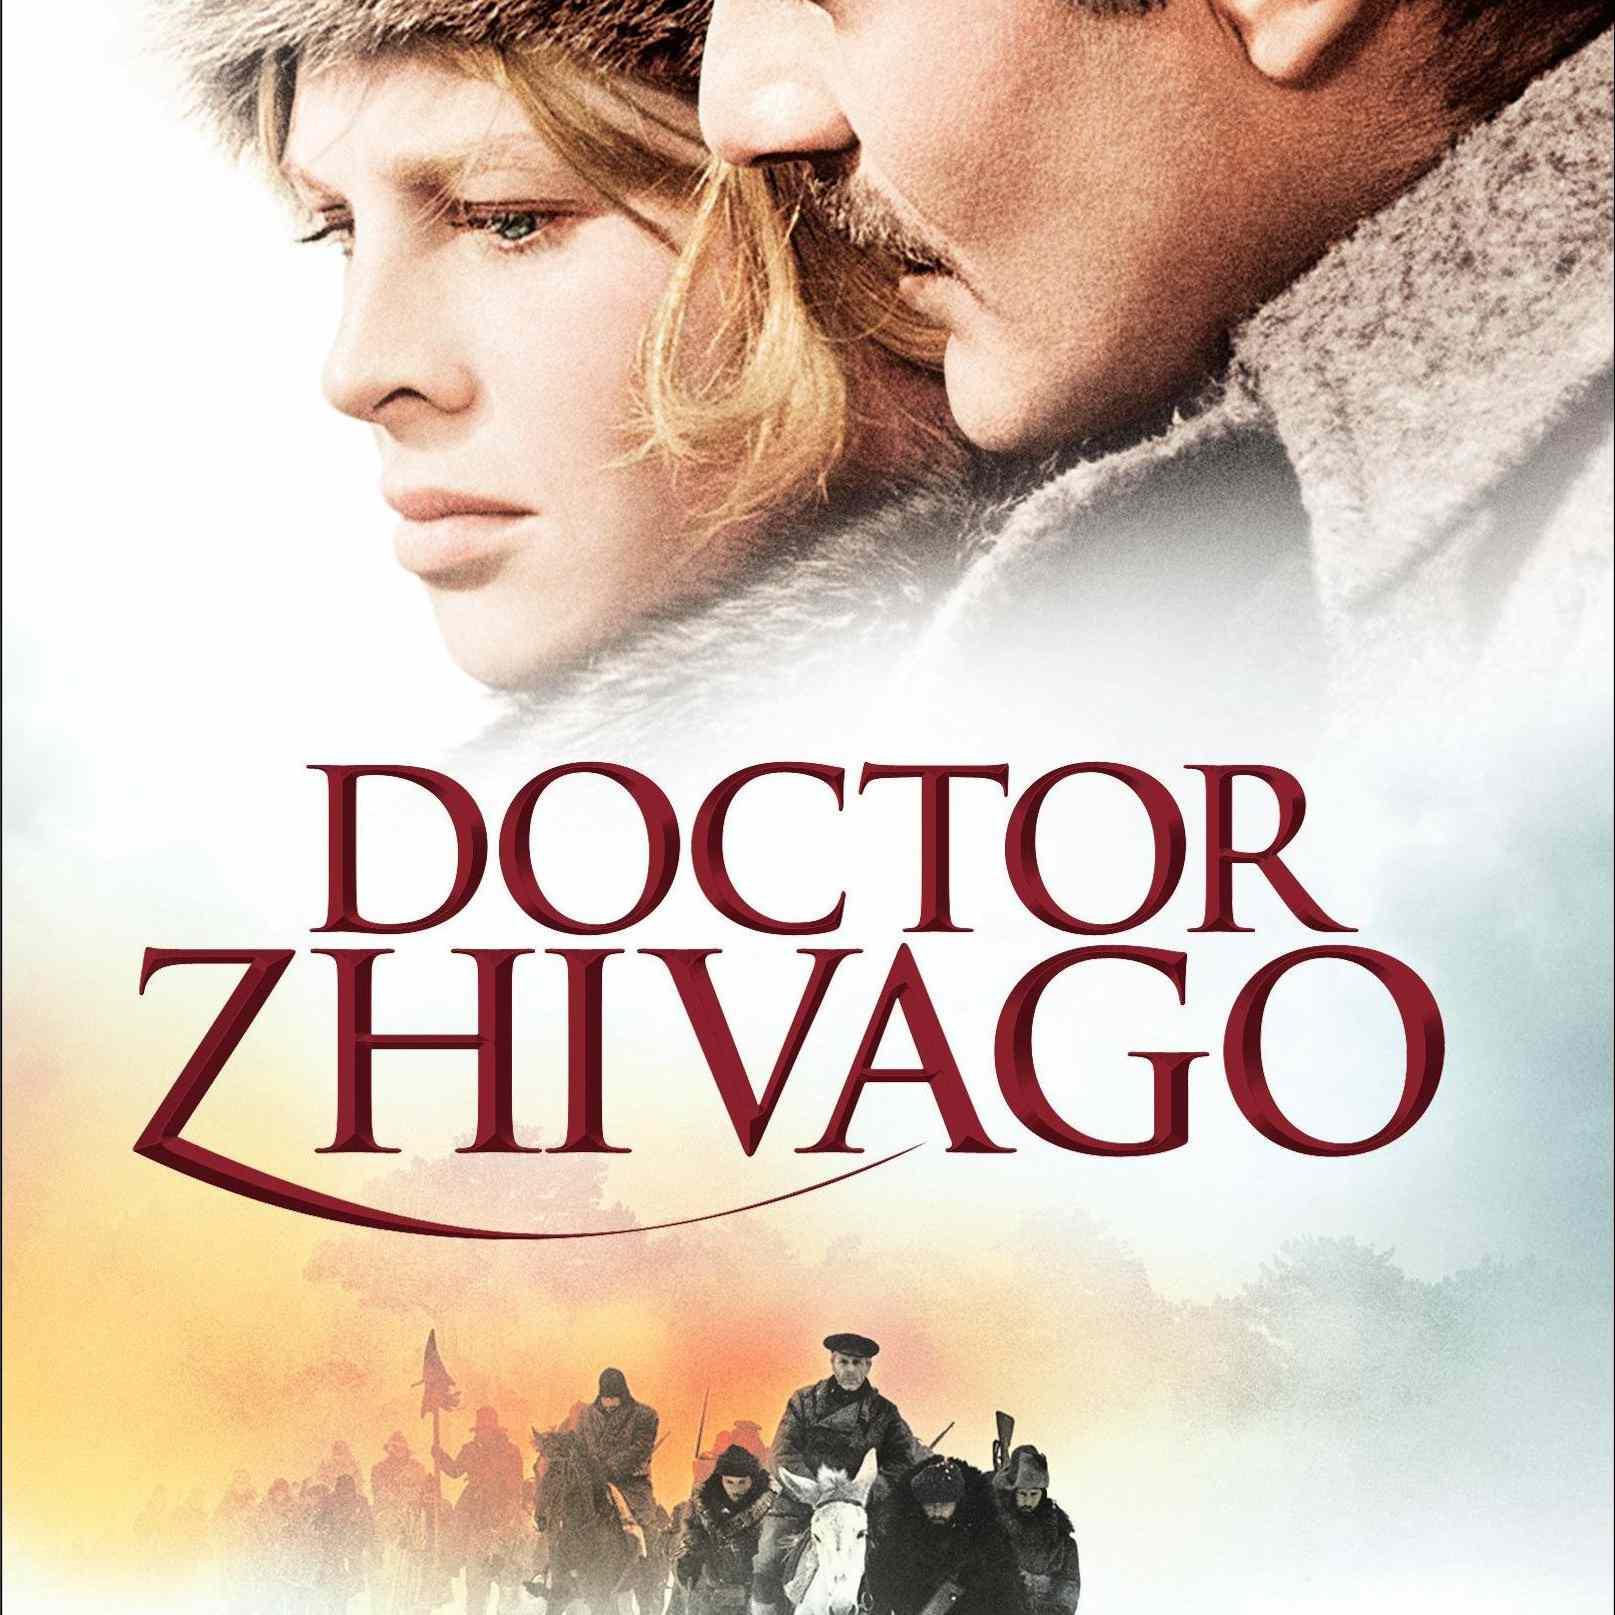 doctor-zhivago-dvd-cover-85.jpg